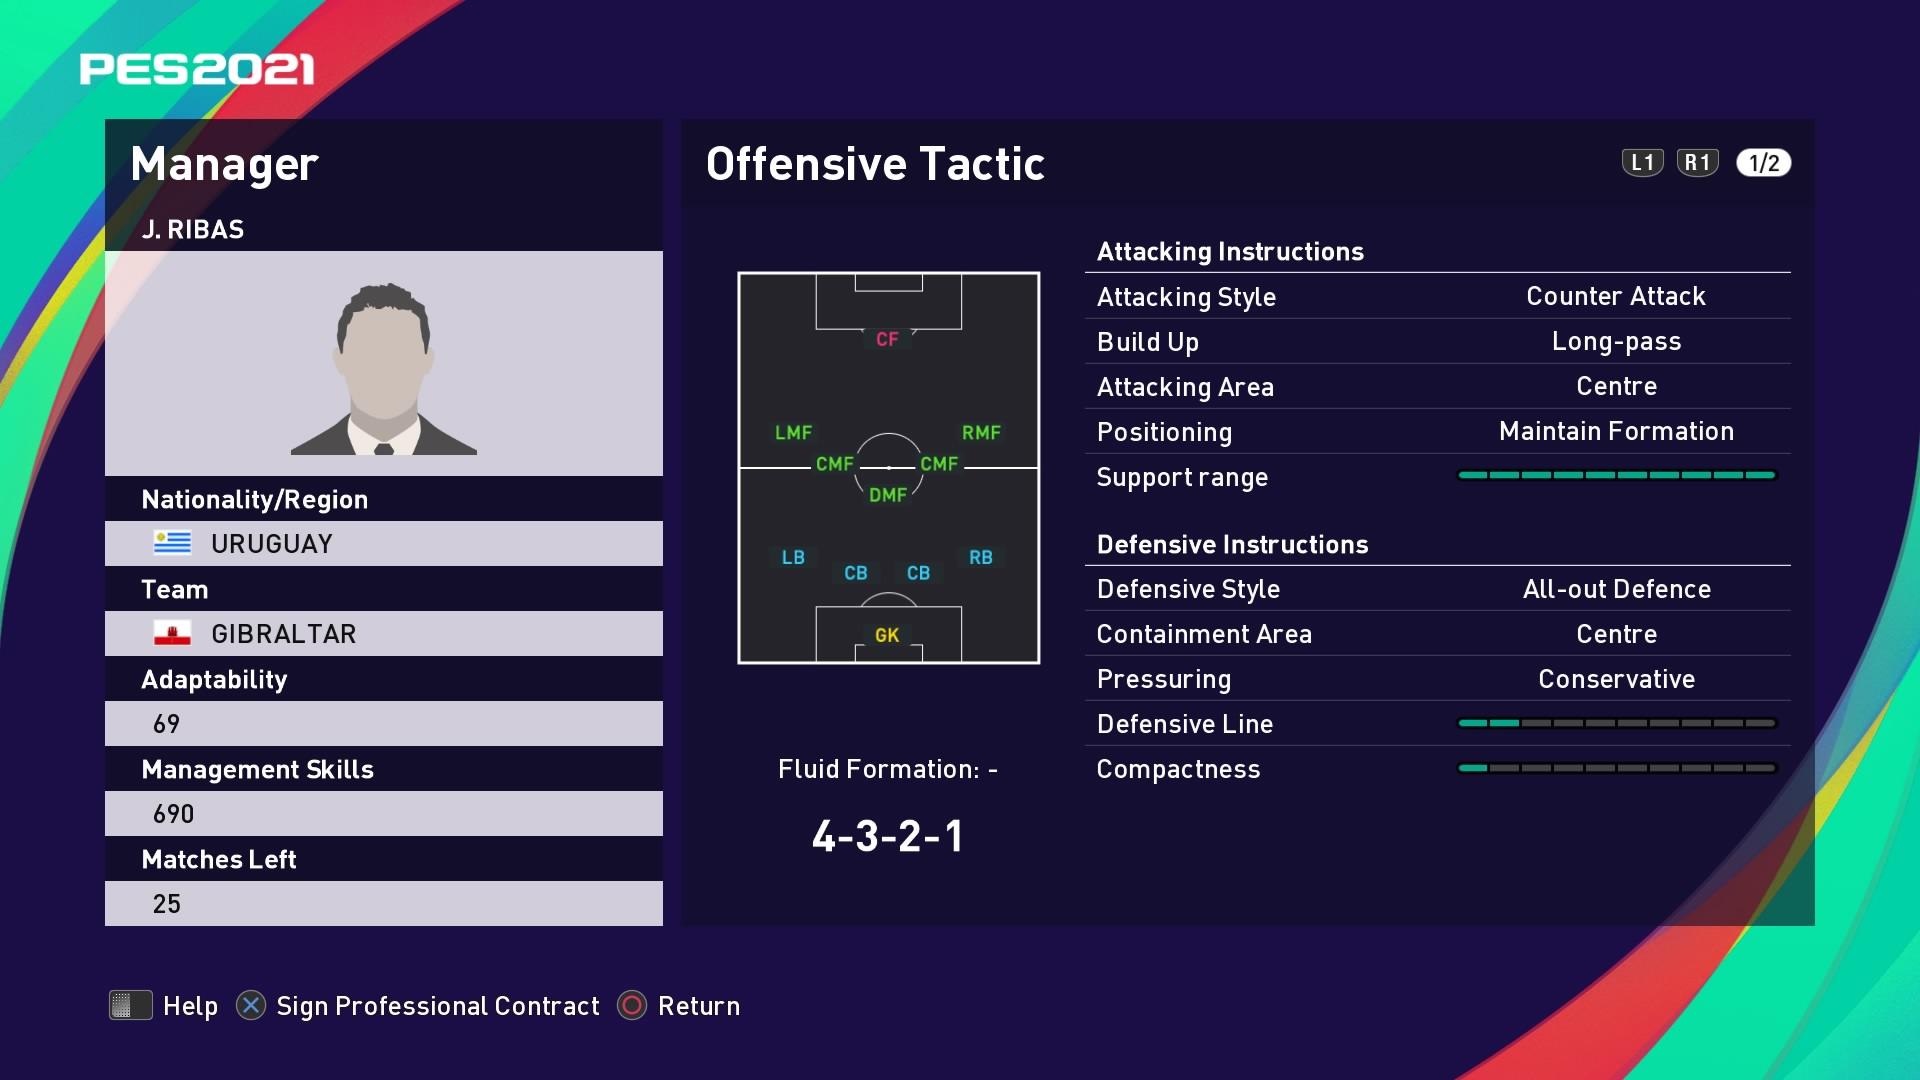 J. Ribas (Julio César Ribas) Offensive Tactic in PES 2021 myClub